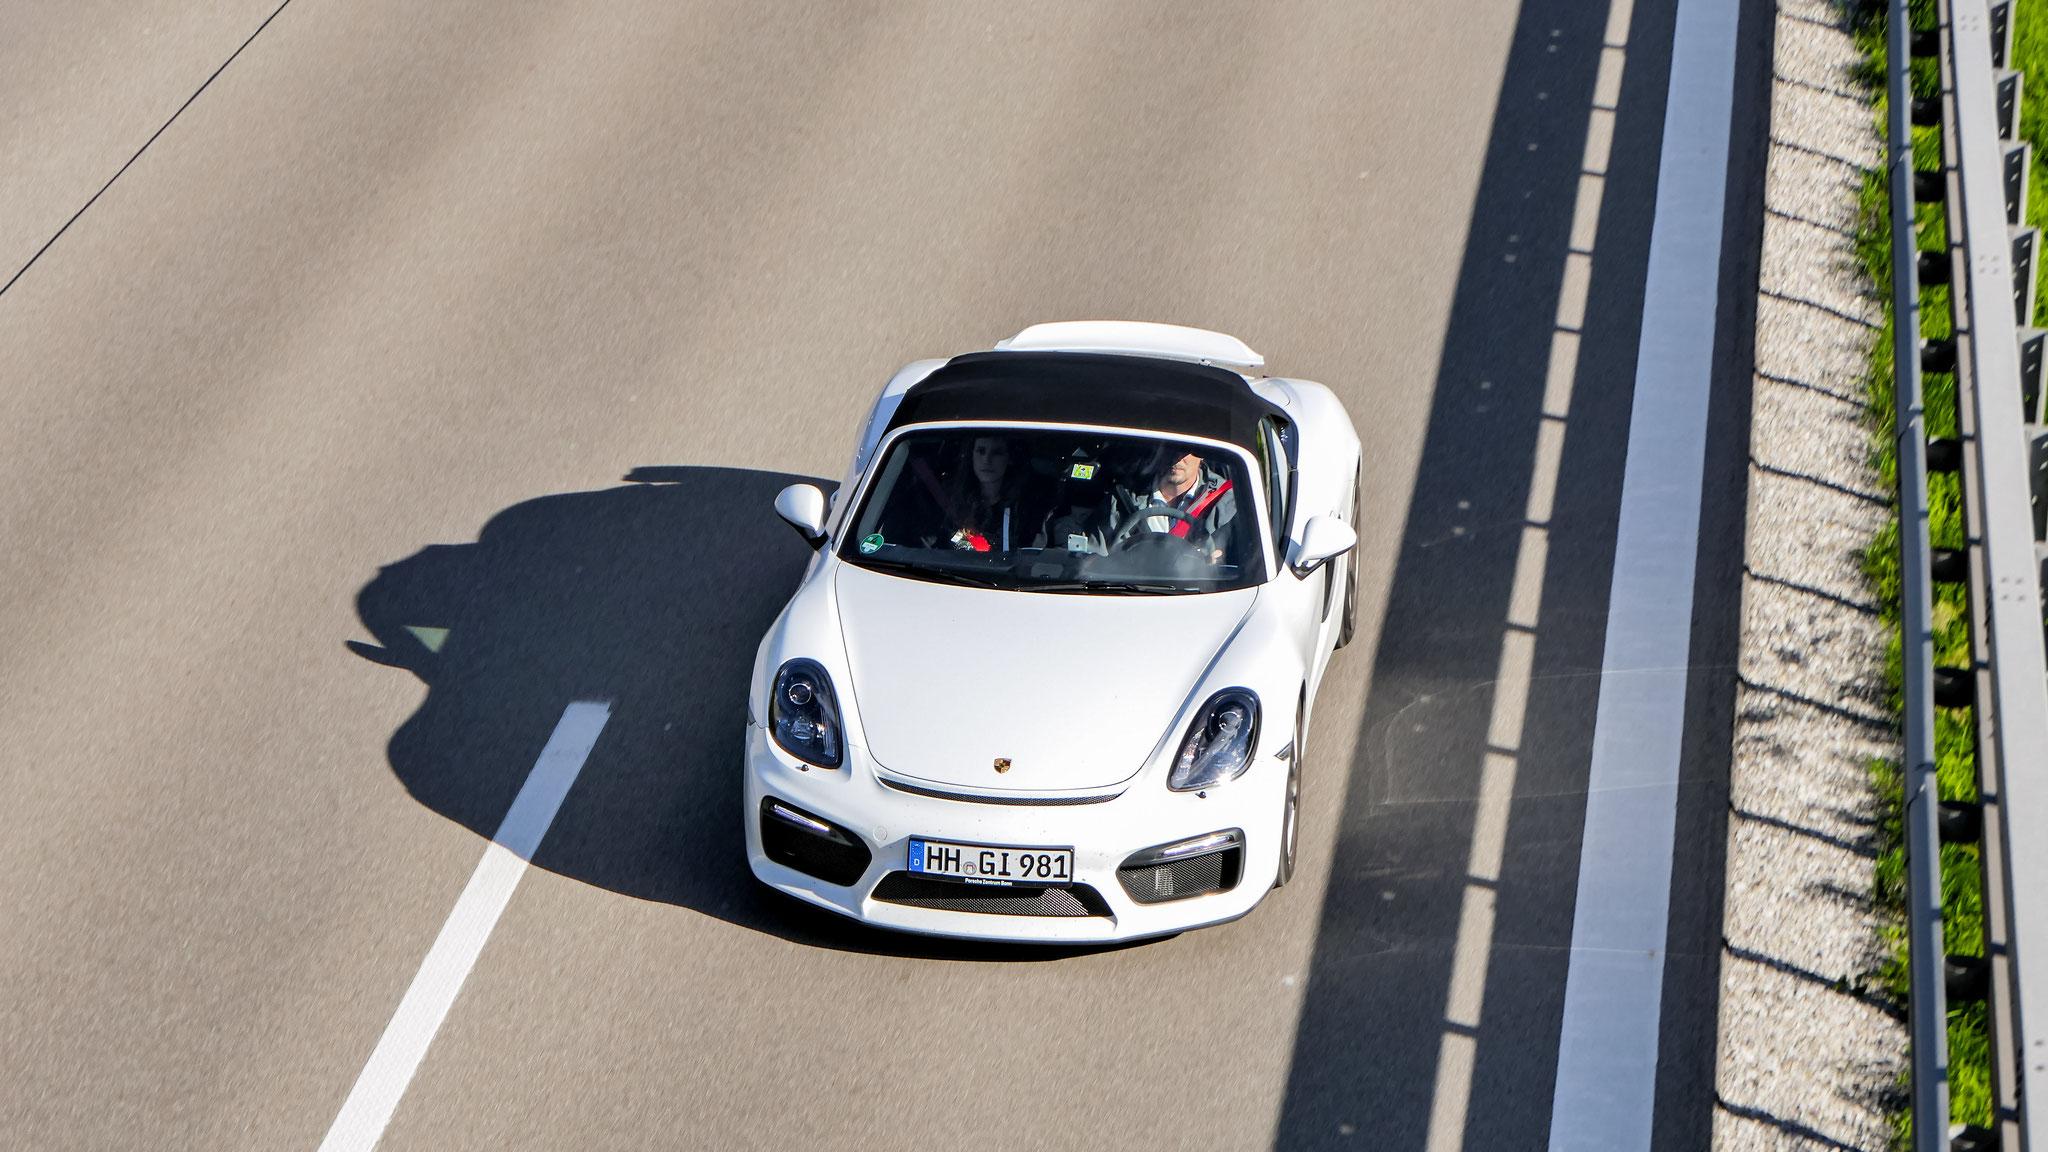 Porsche 718 Spyder - HH-GI-981